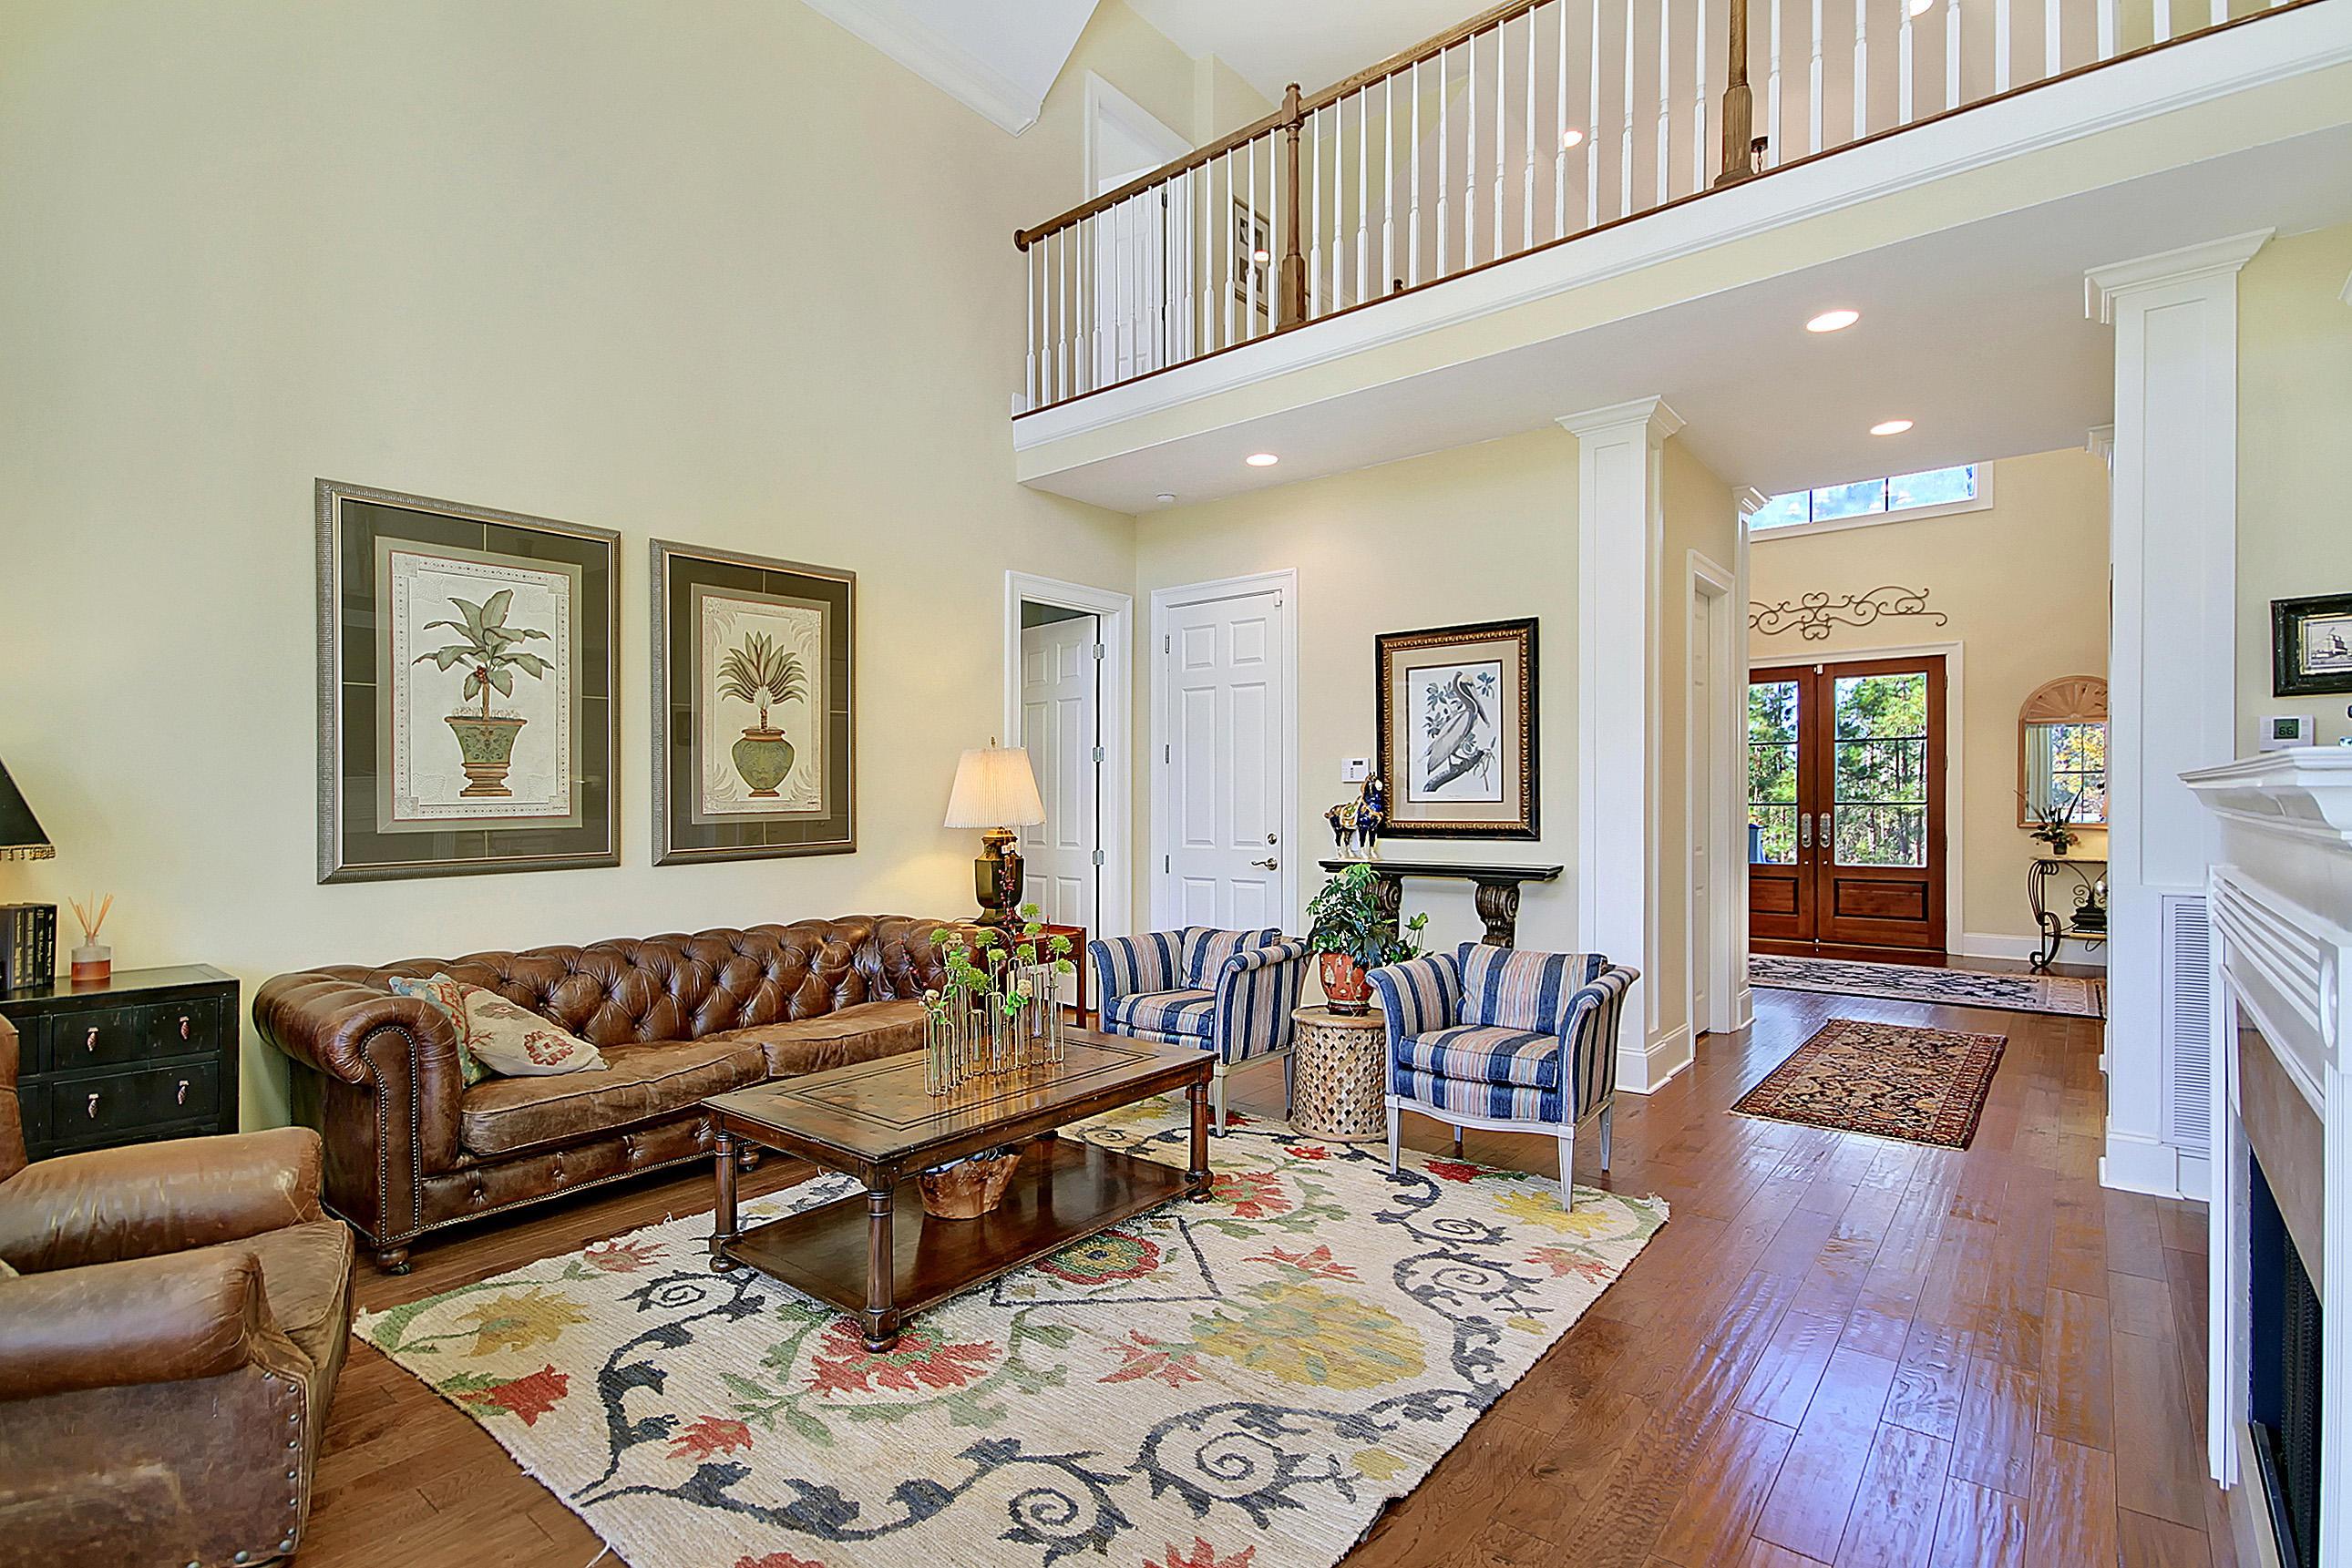 Rivertowne Country Club Homes For Sale - 2601 Kiln Creek, Mount Pleasant, SC - 74